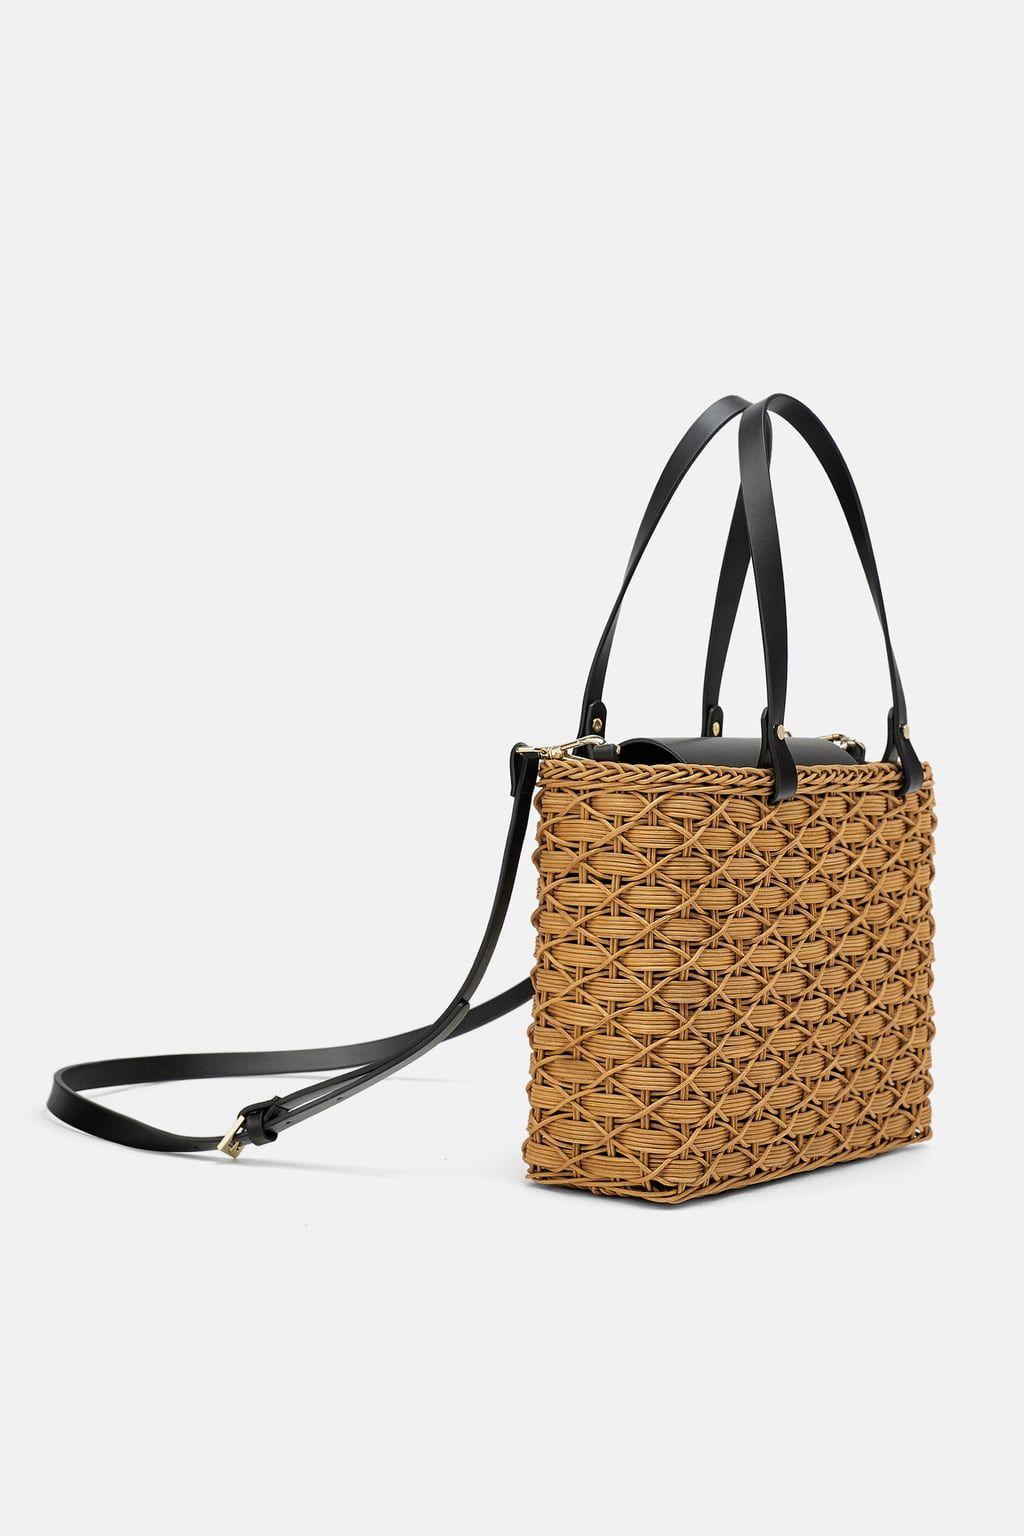 ac1a6c4b0df5 Natural basket bag in 2019 | ♛ Smart Casual ♛ To Buy @ Zara ...